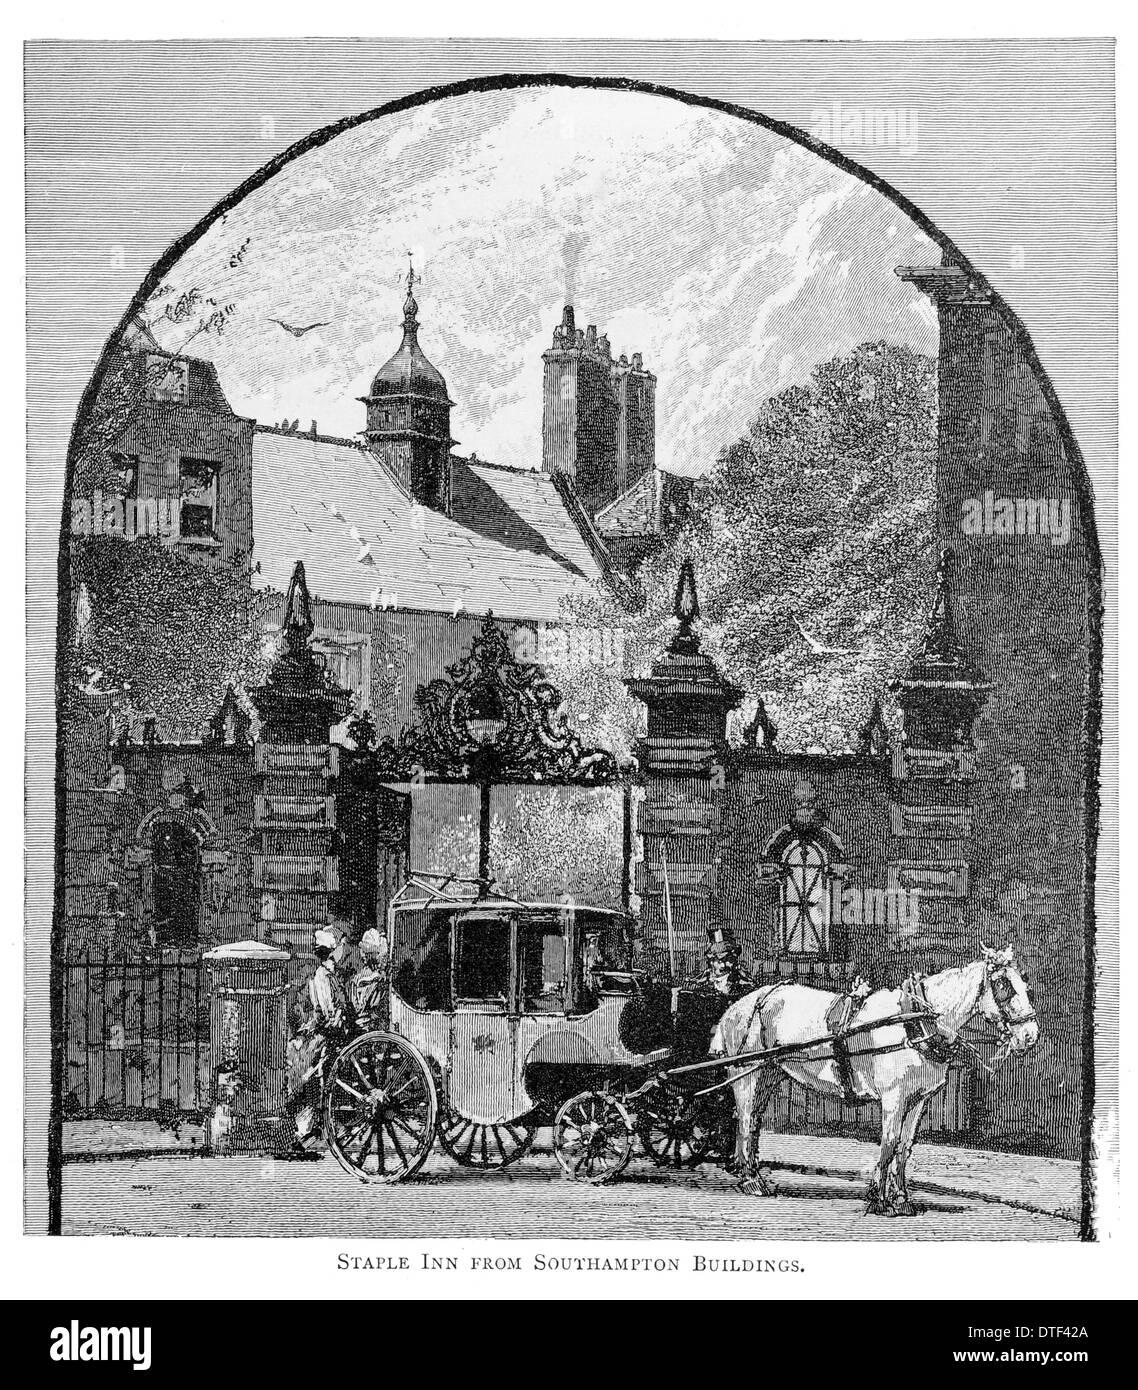 Staple Inn from Southampton Buildings Circa 1890 - Stock Image